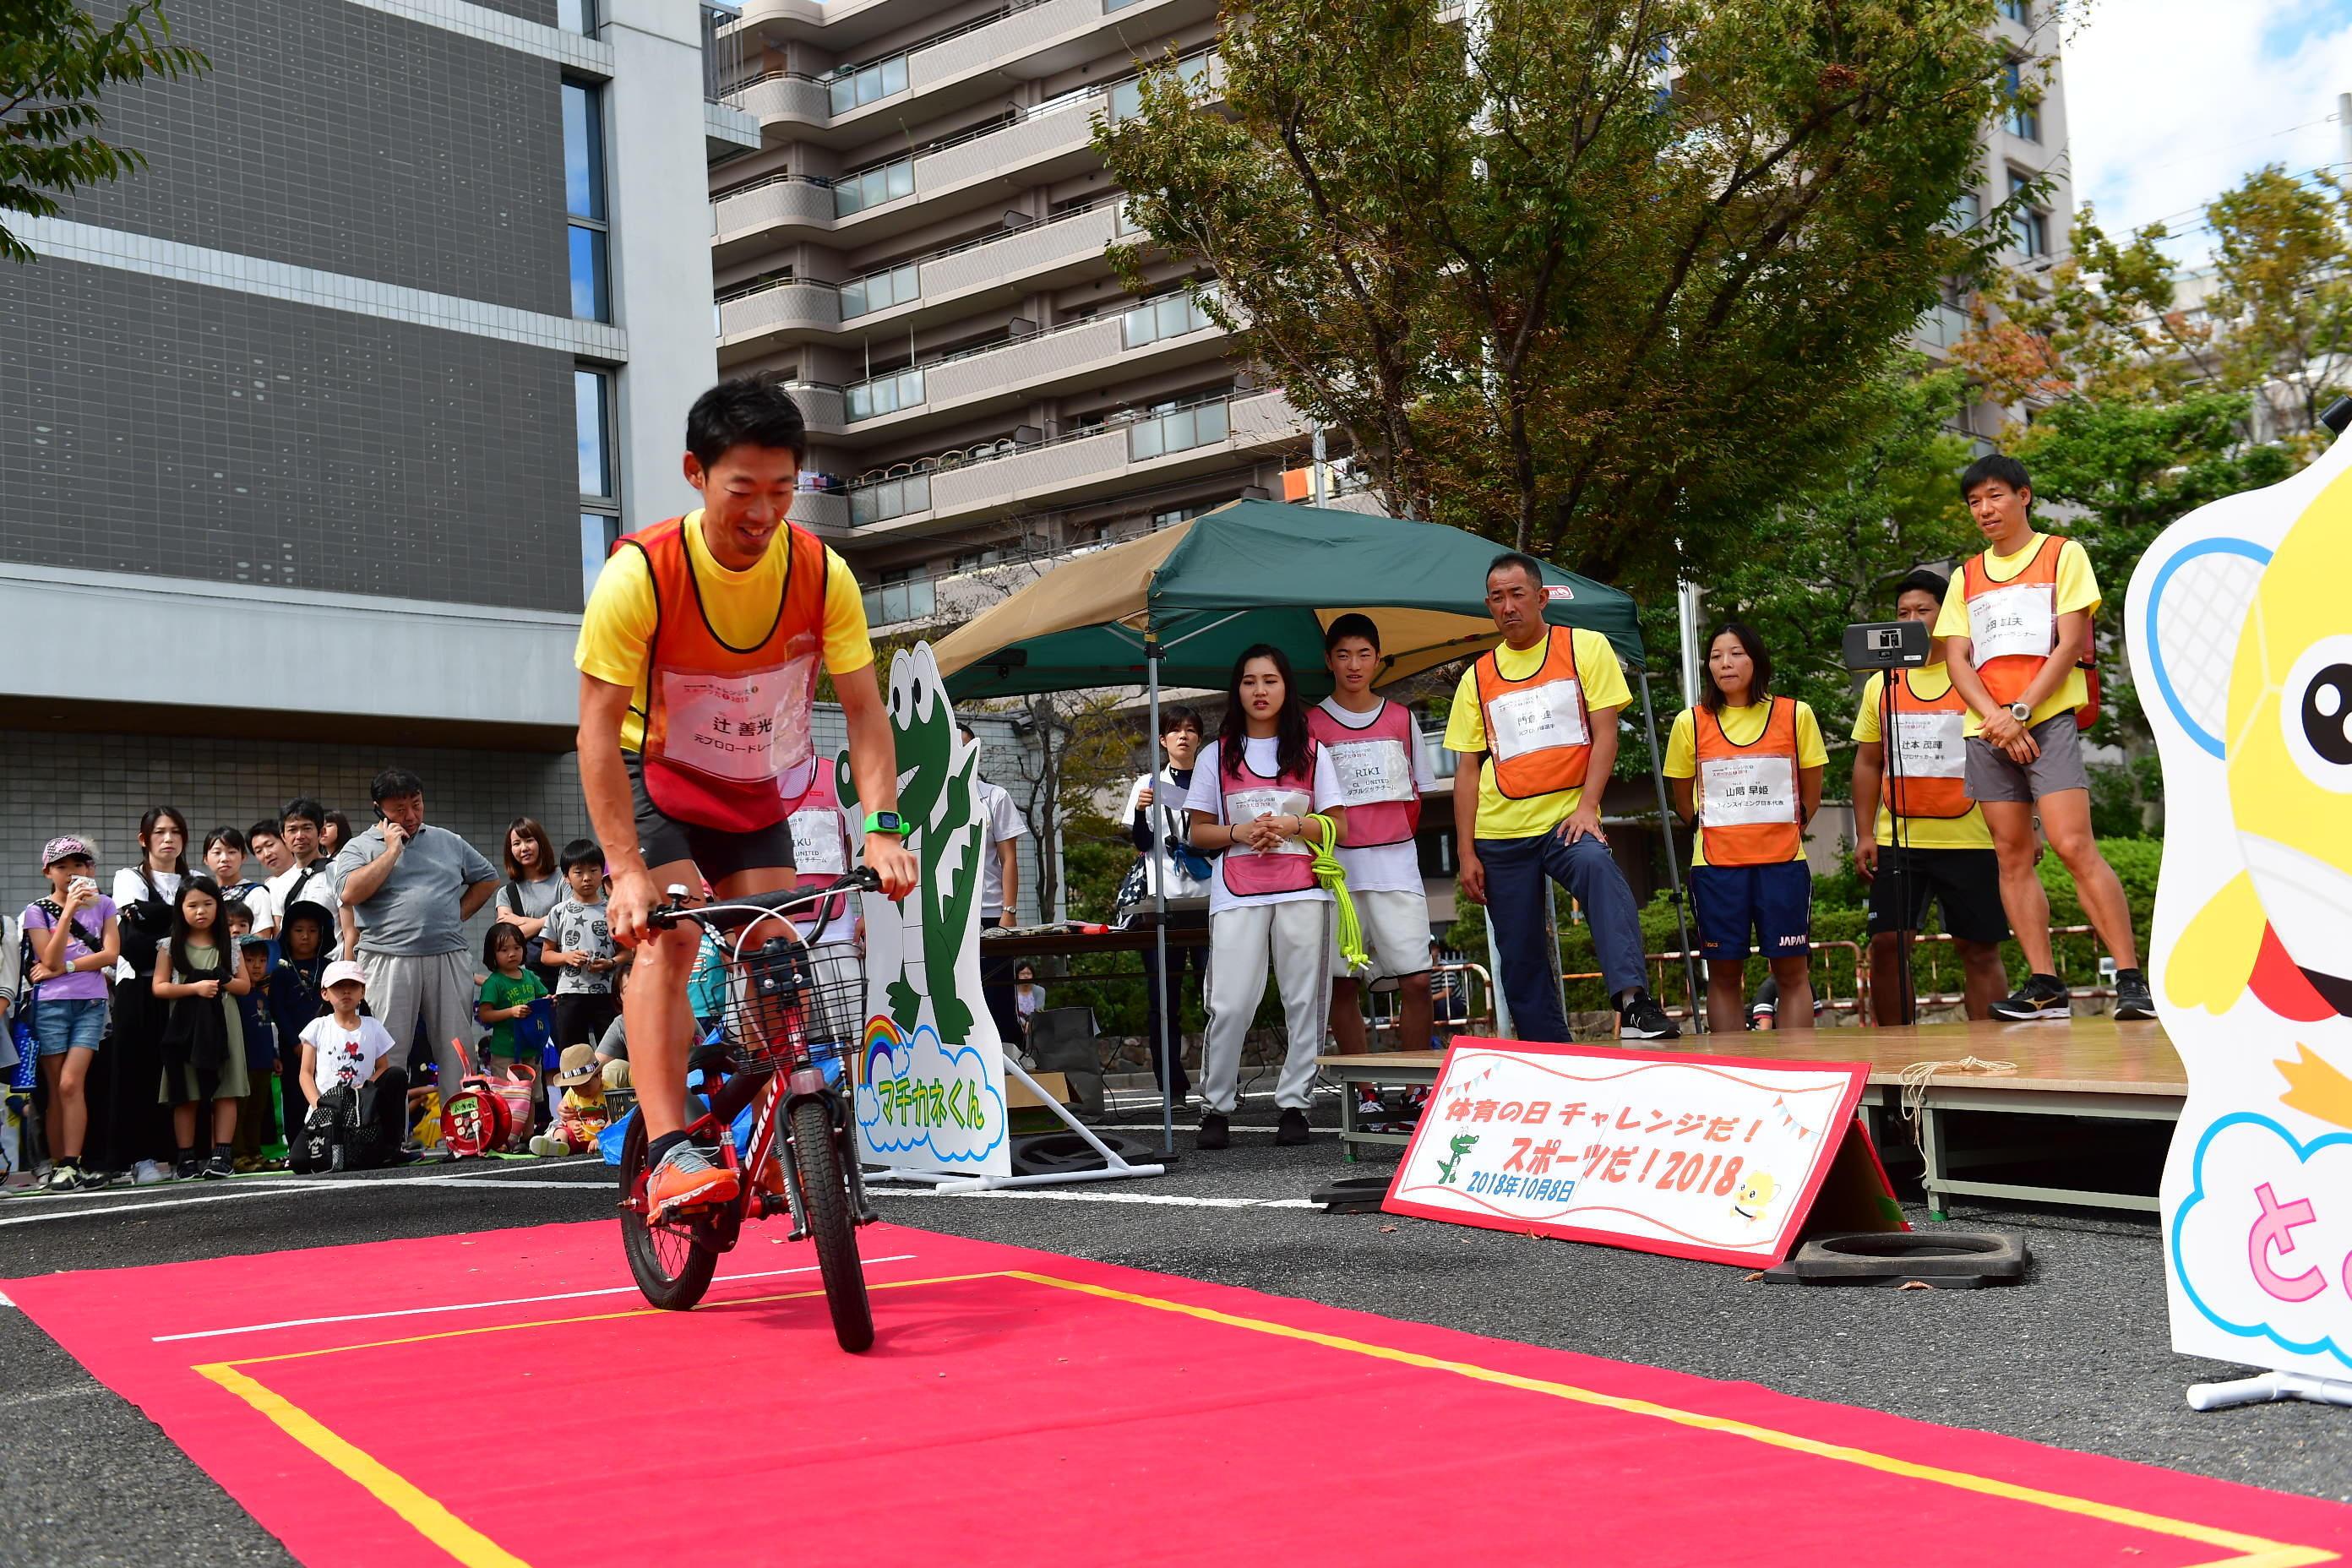 http://news.yoshimoto.co.jp/20181008191808-c19911efd8a47b9d80aee4fa6120434ef6c94697.jpg